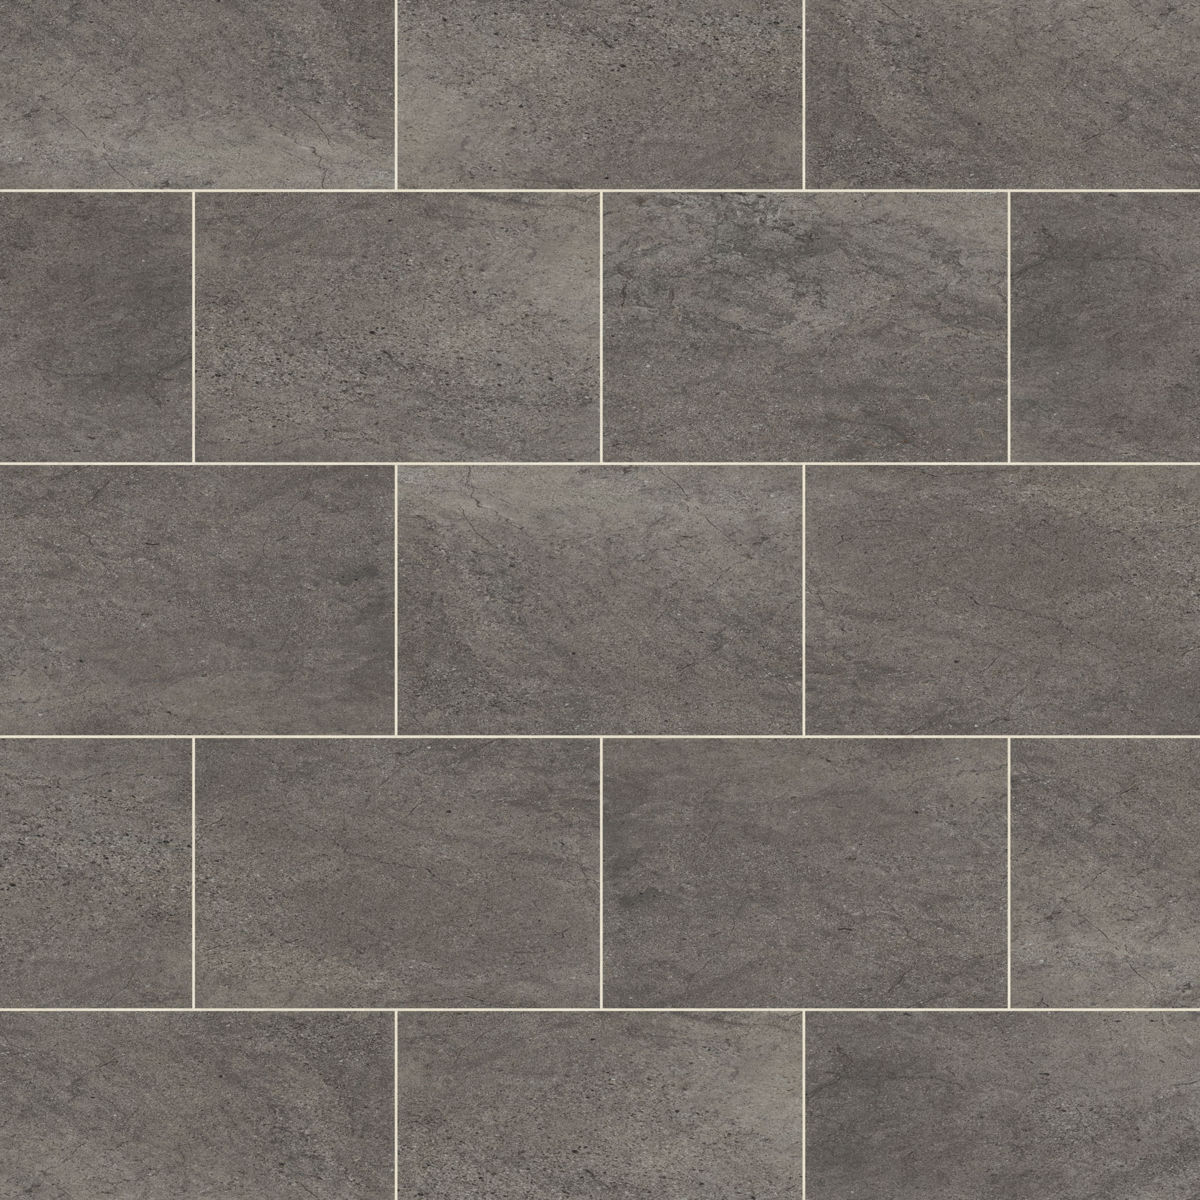 Karndean knight tile cumbrian stone st14 vinyl flooring for Pictures of tile floors